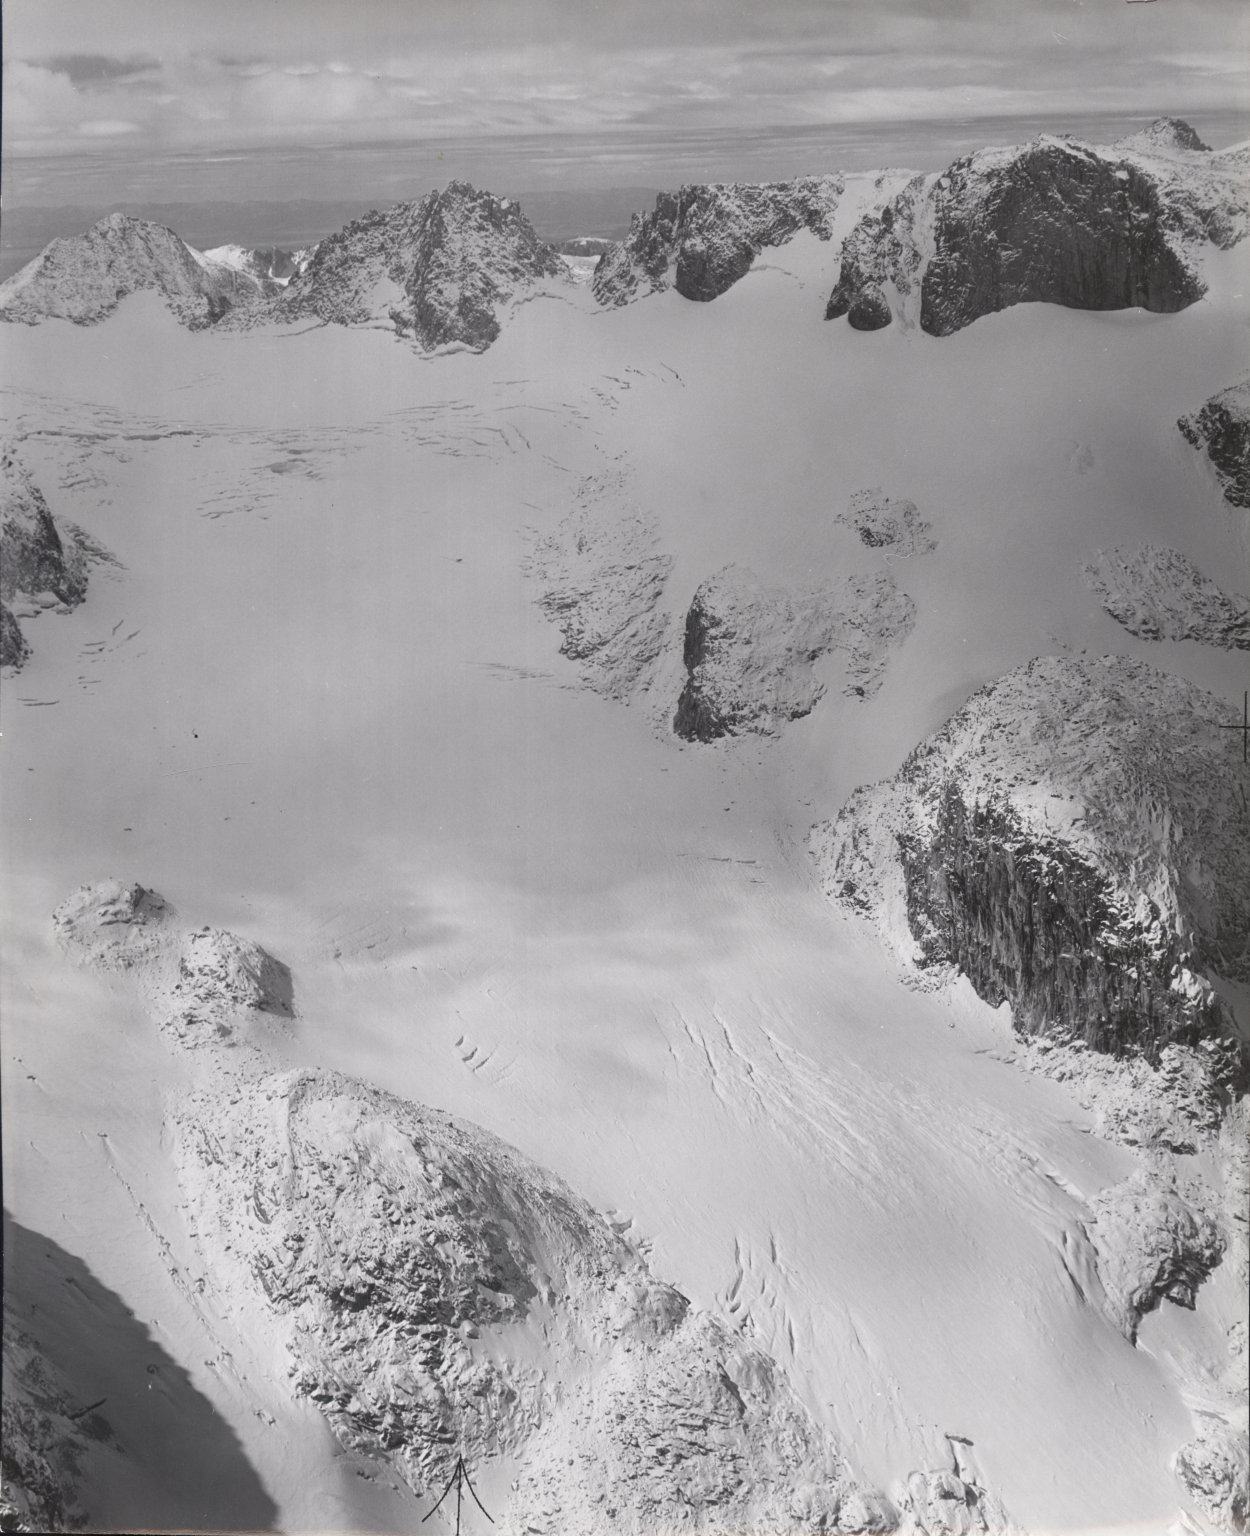 Mammoth Glacier, Wyoming, United States